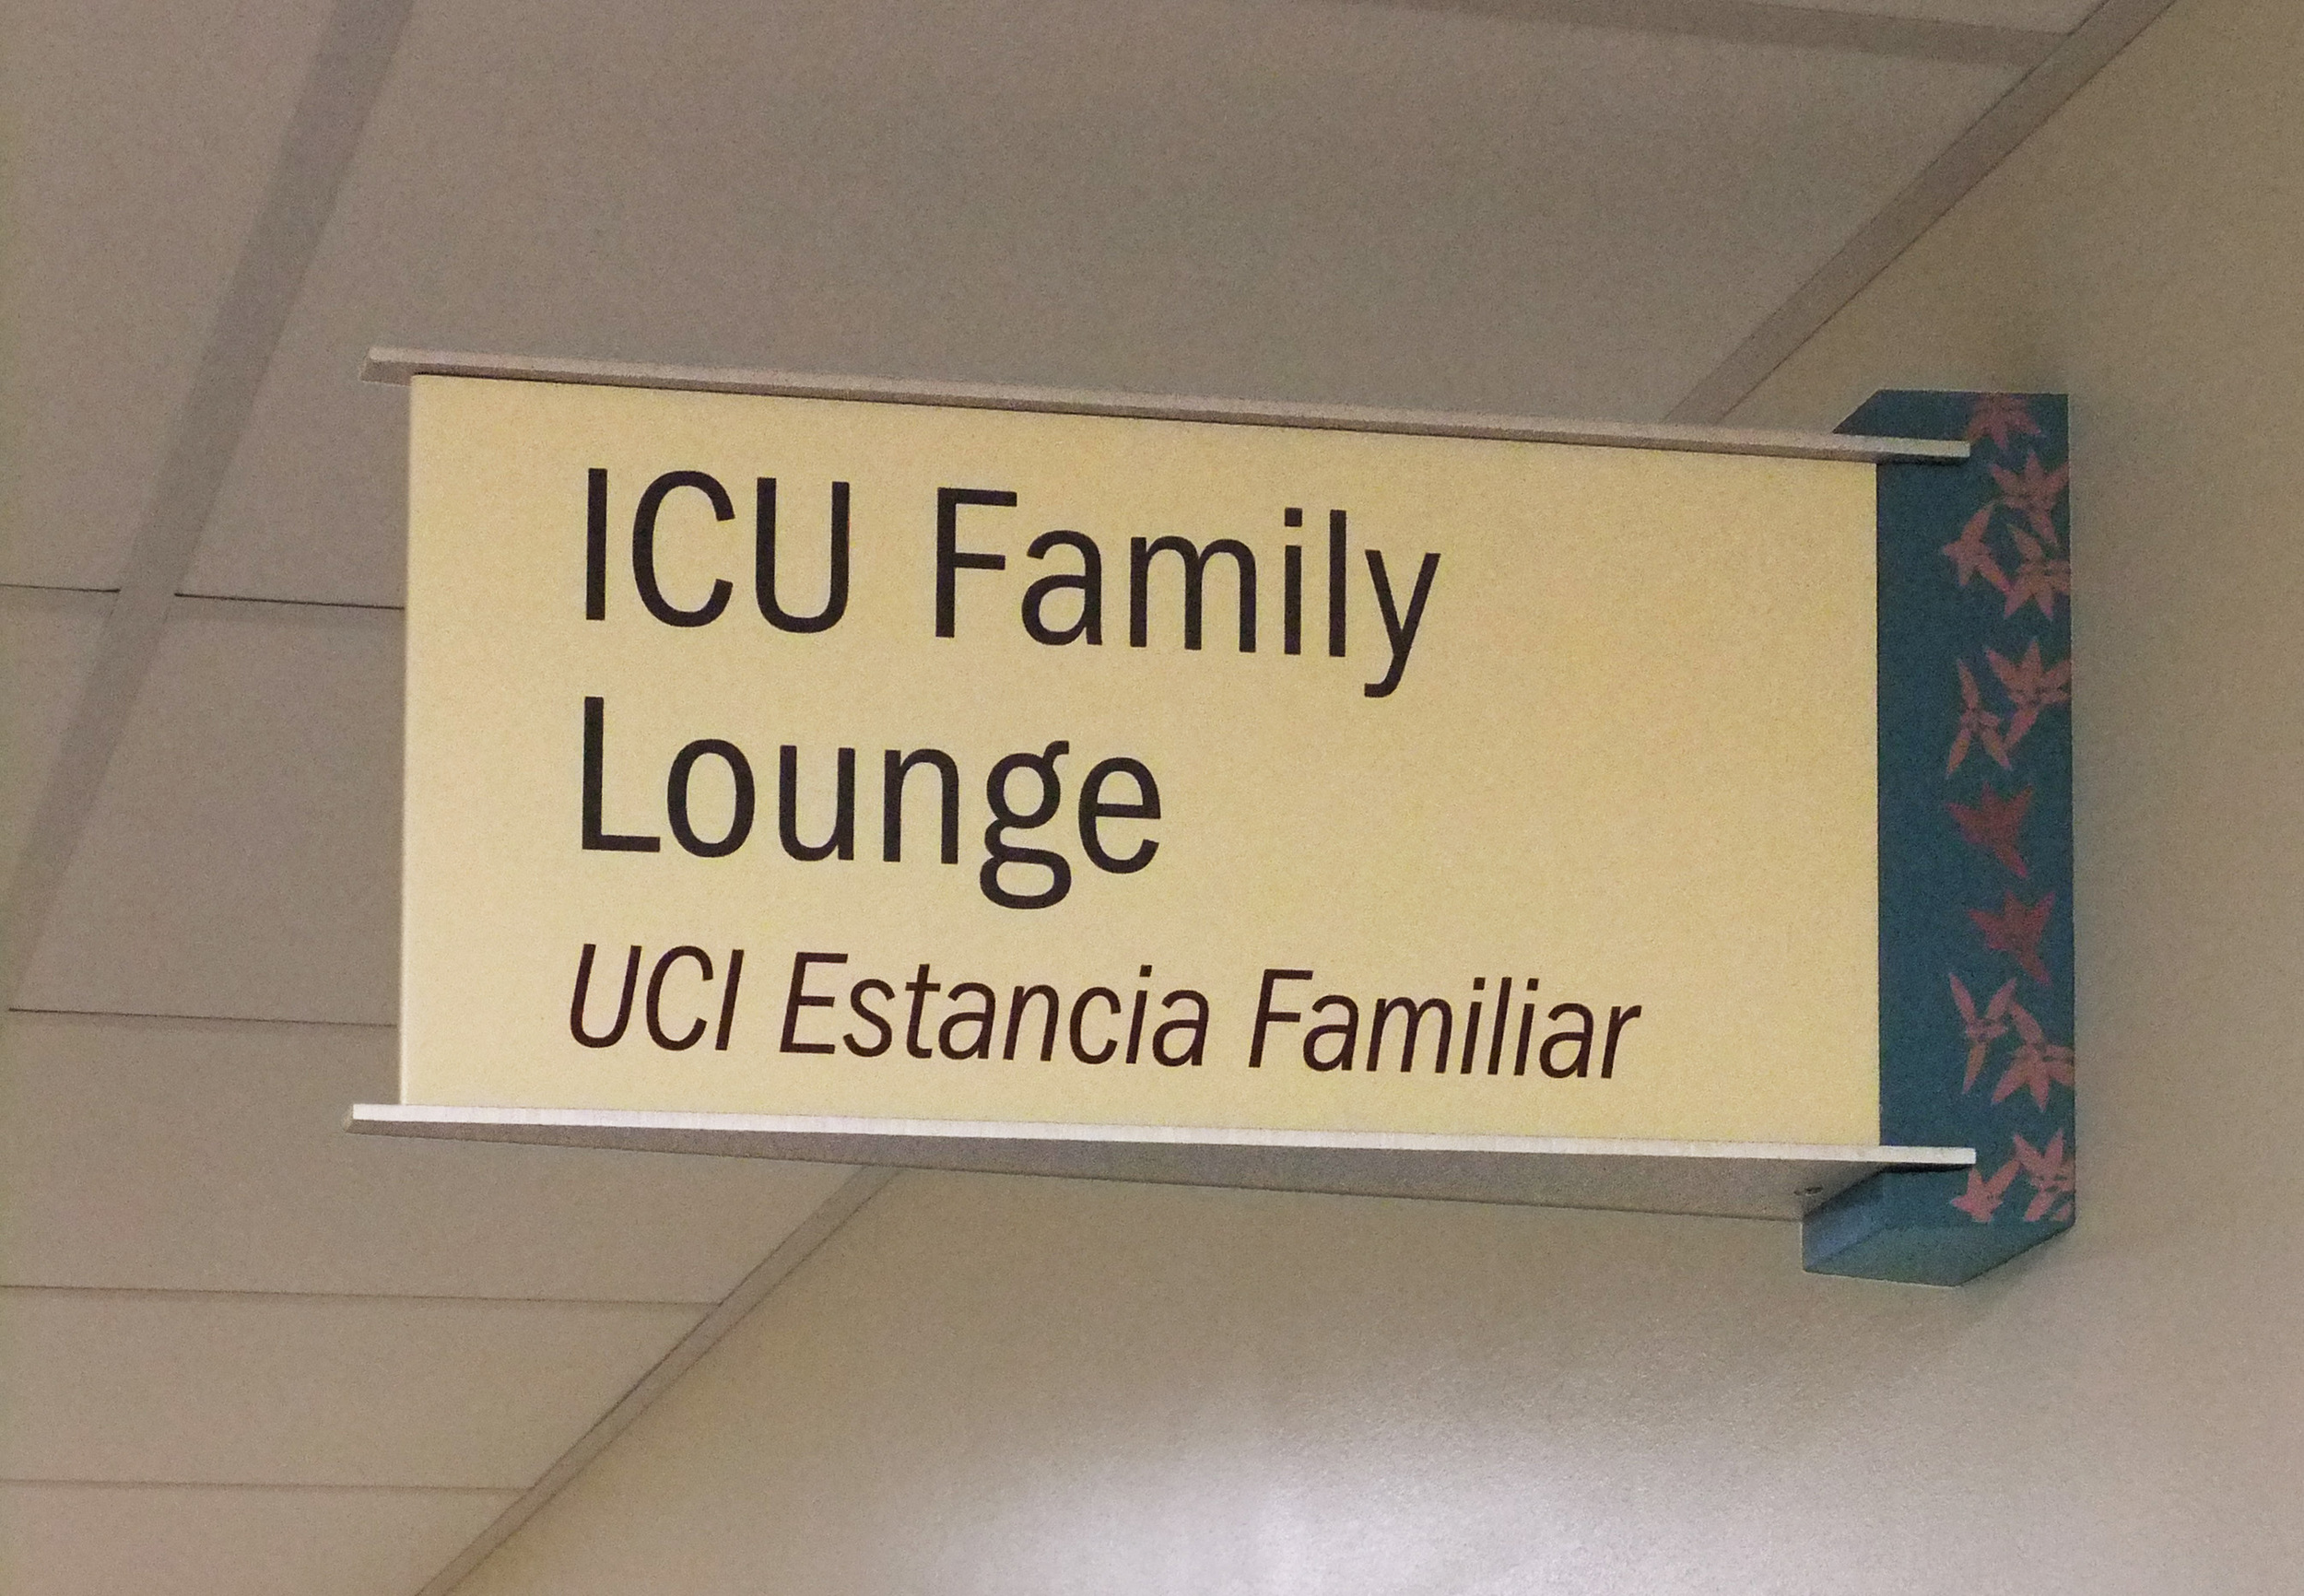 Hospital_projecting_sign.jpg